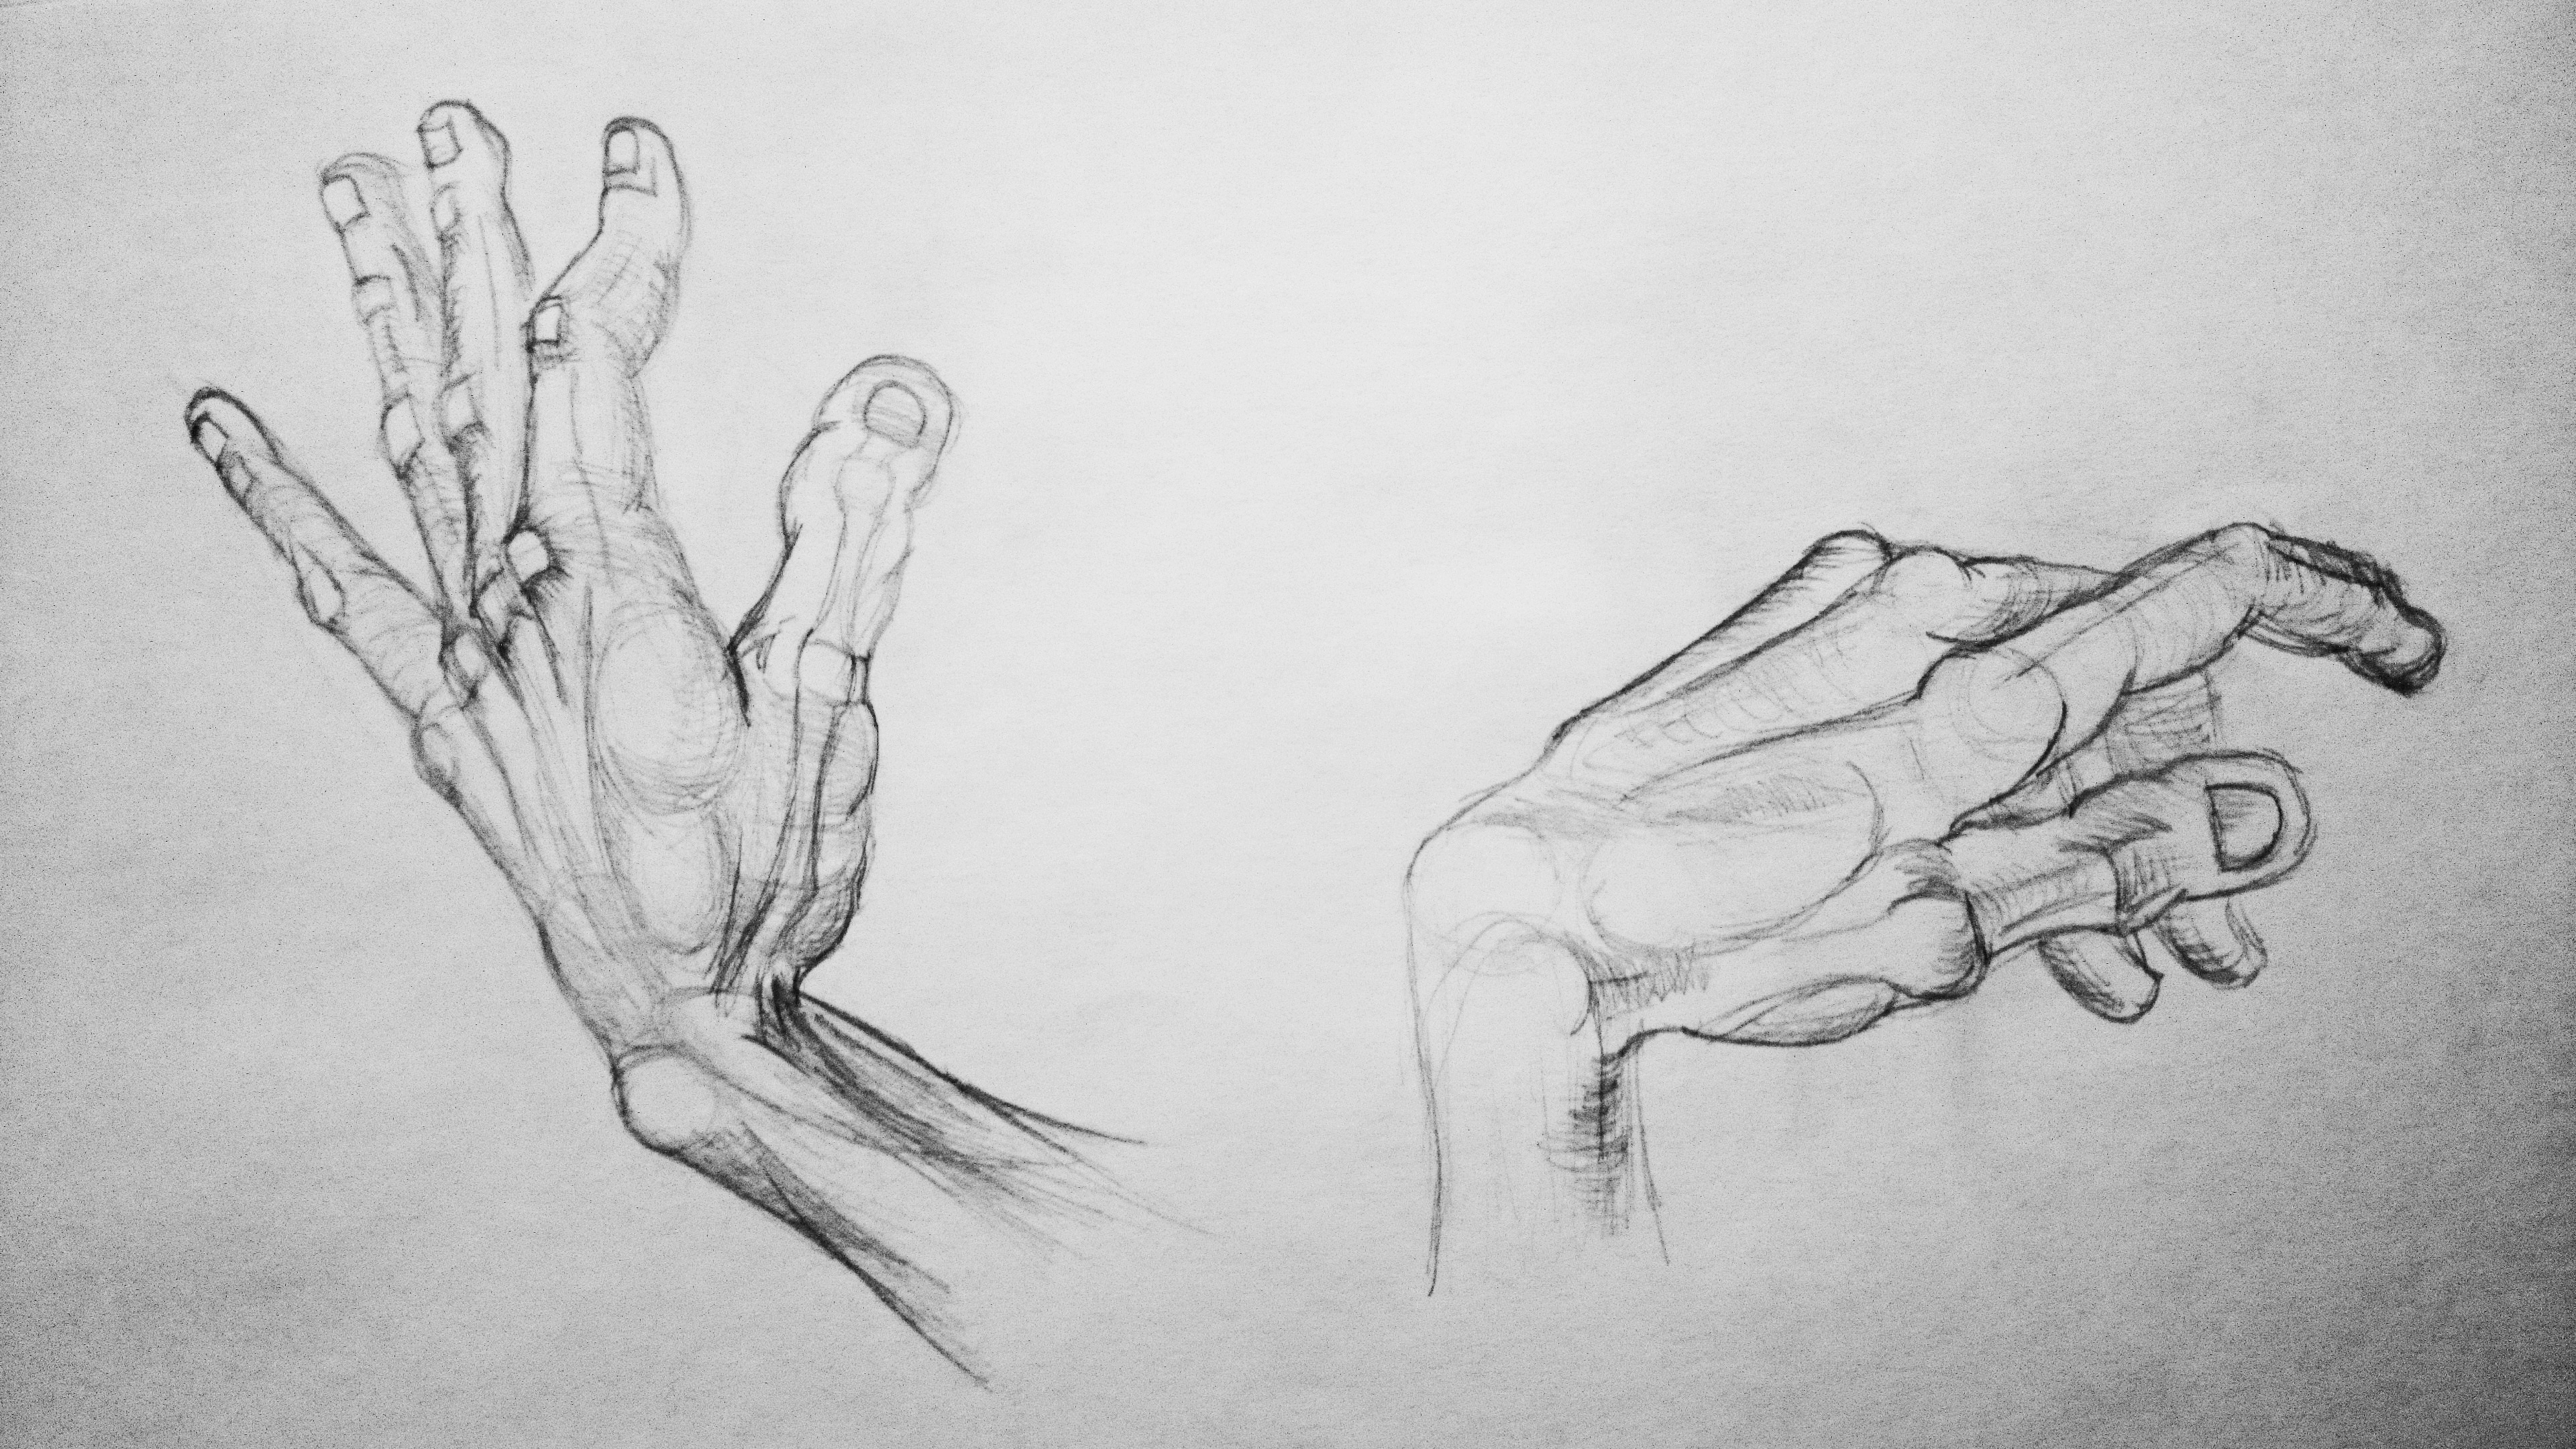 Body parts: hands